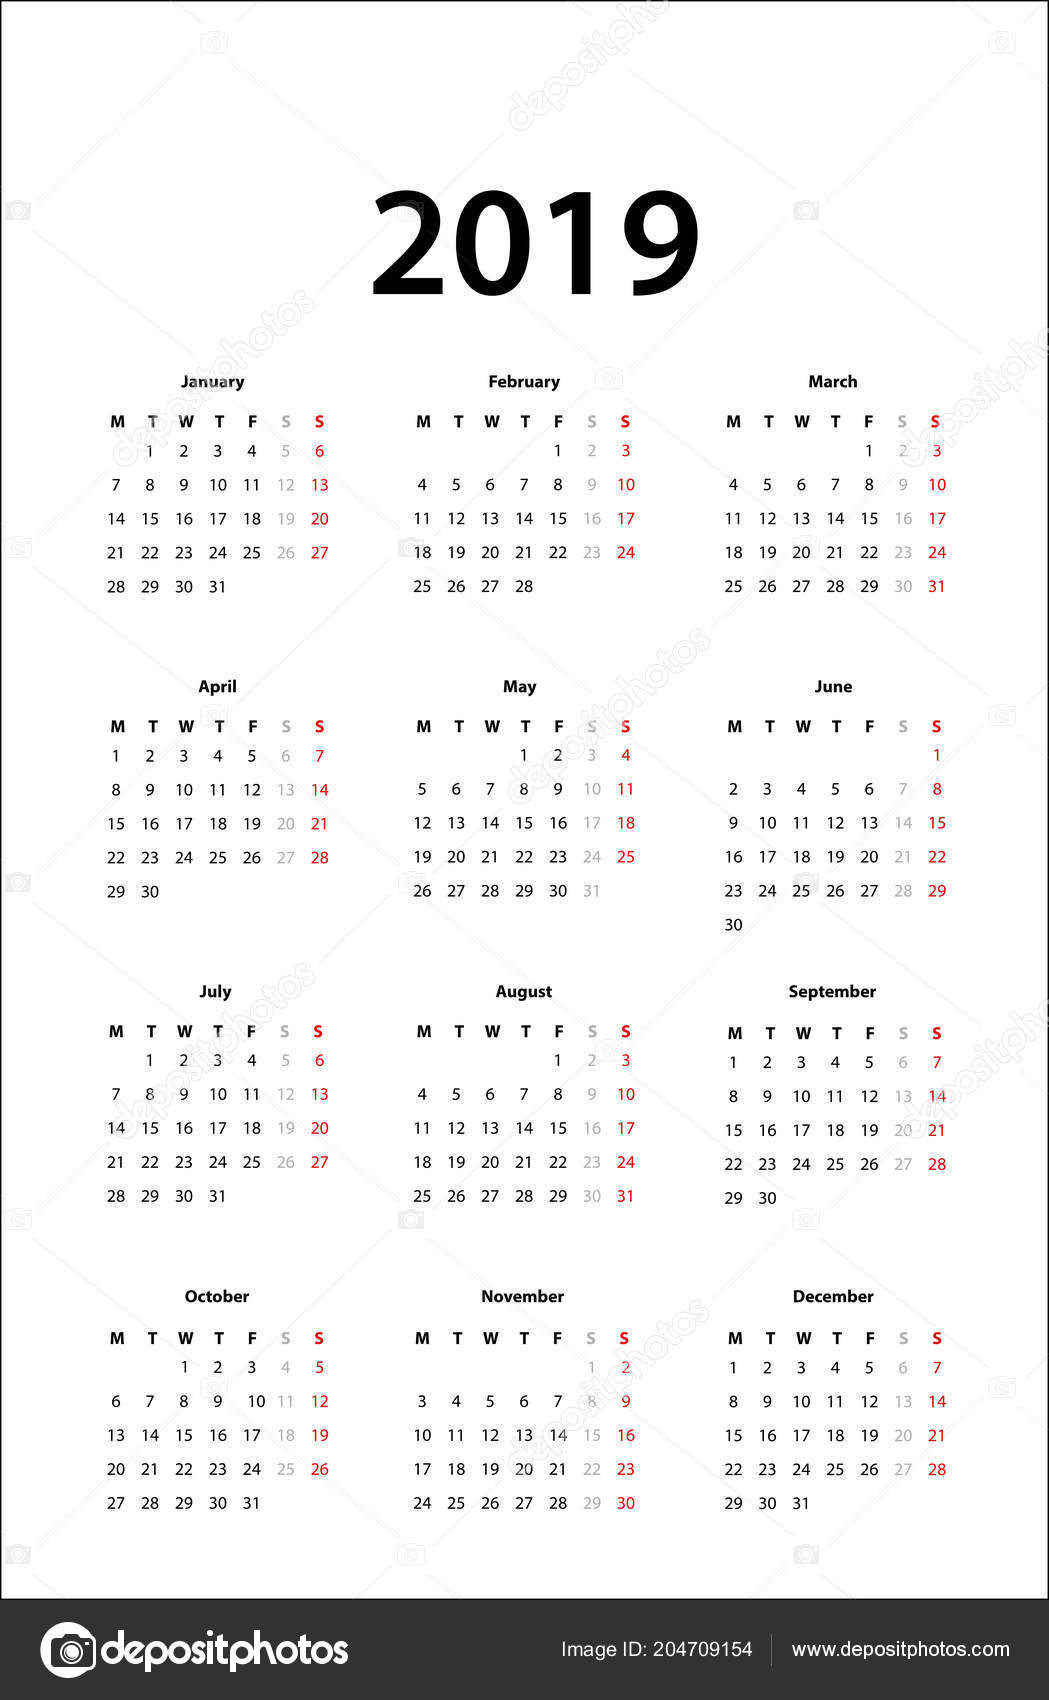 Template Calendrier 2019.Calendar 2019 Simple Calendar Template 2019 Stock Vector